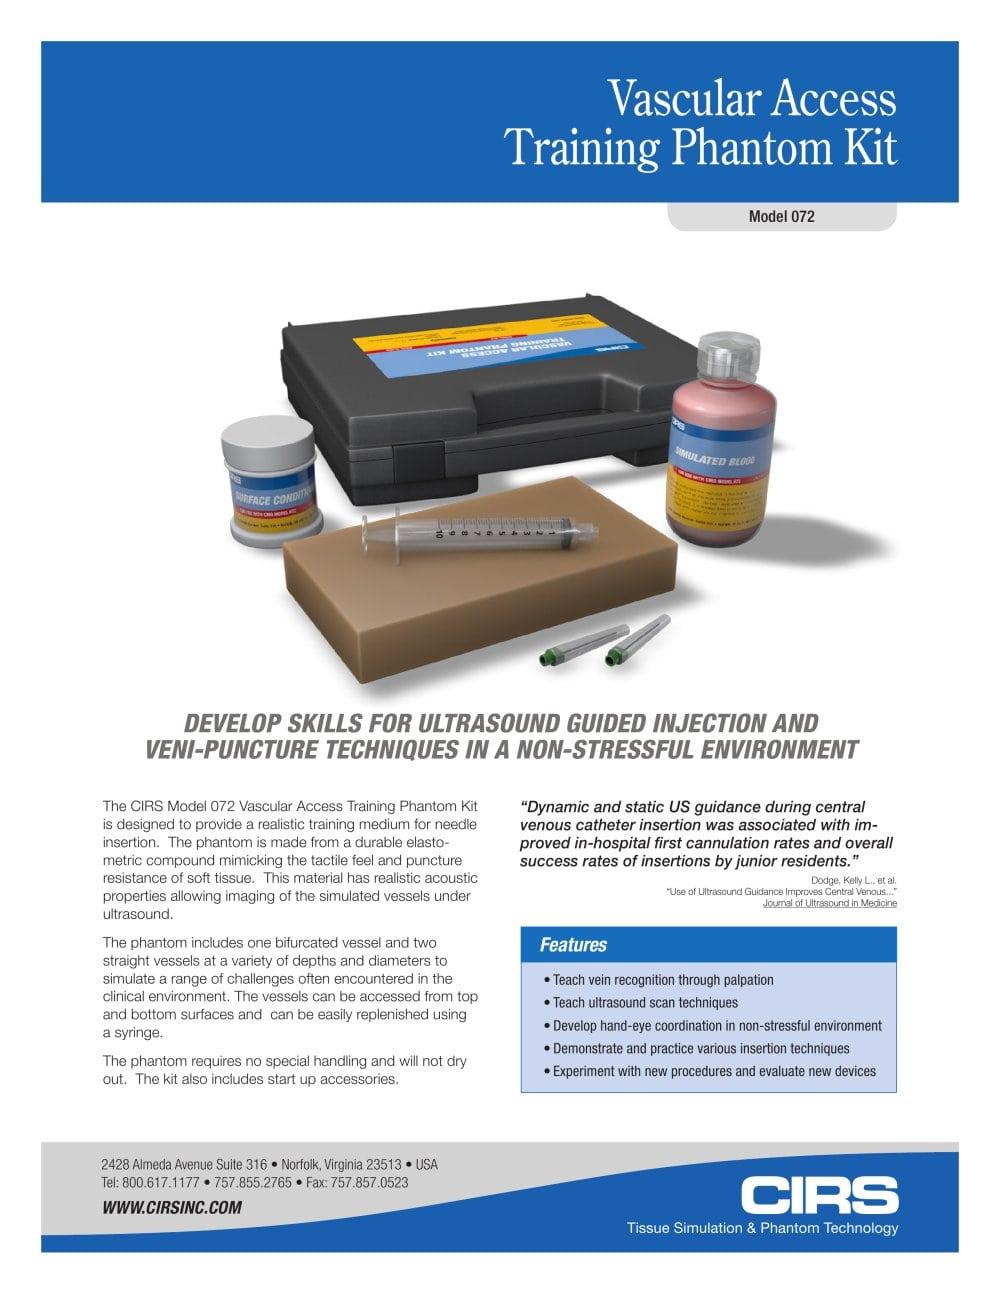 Vascular Access Training Phantom Kit Cirs Pdf Catalogue